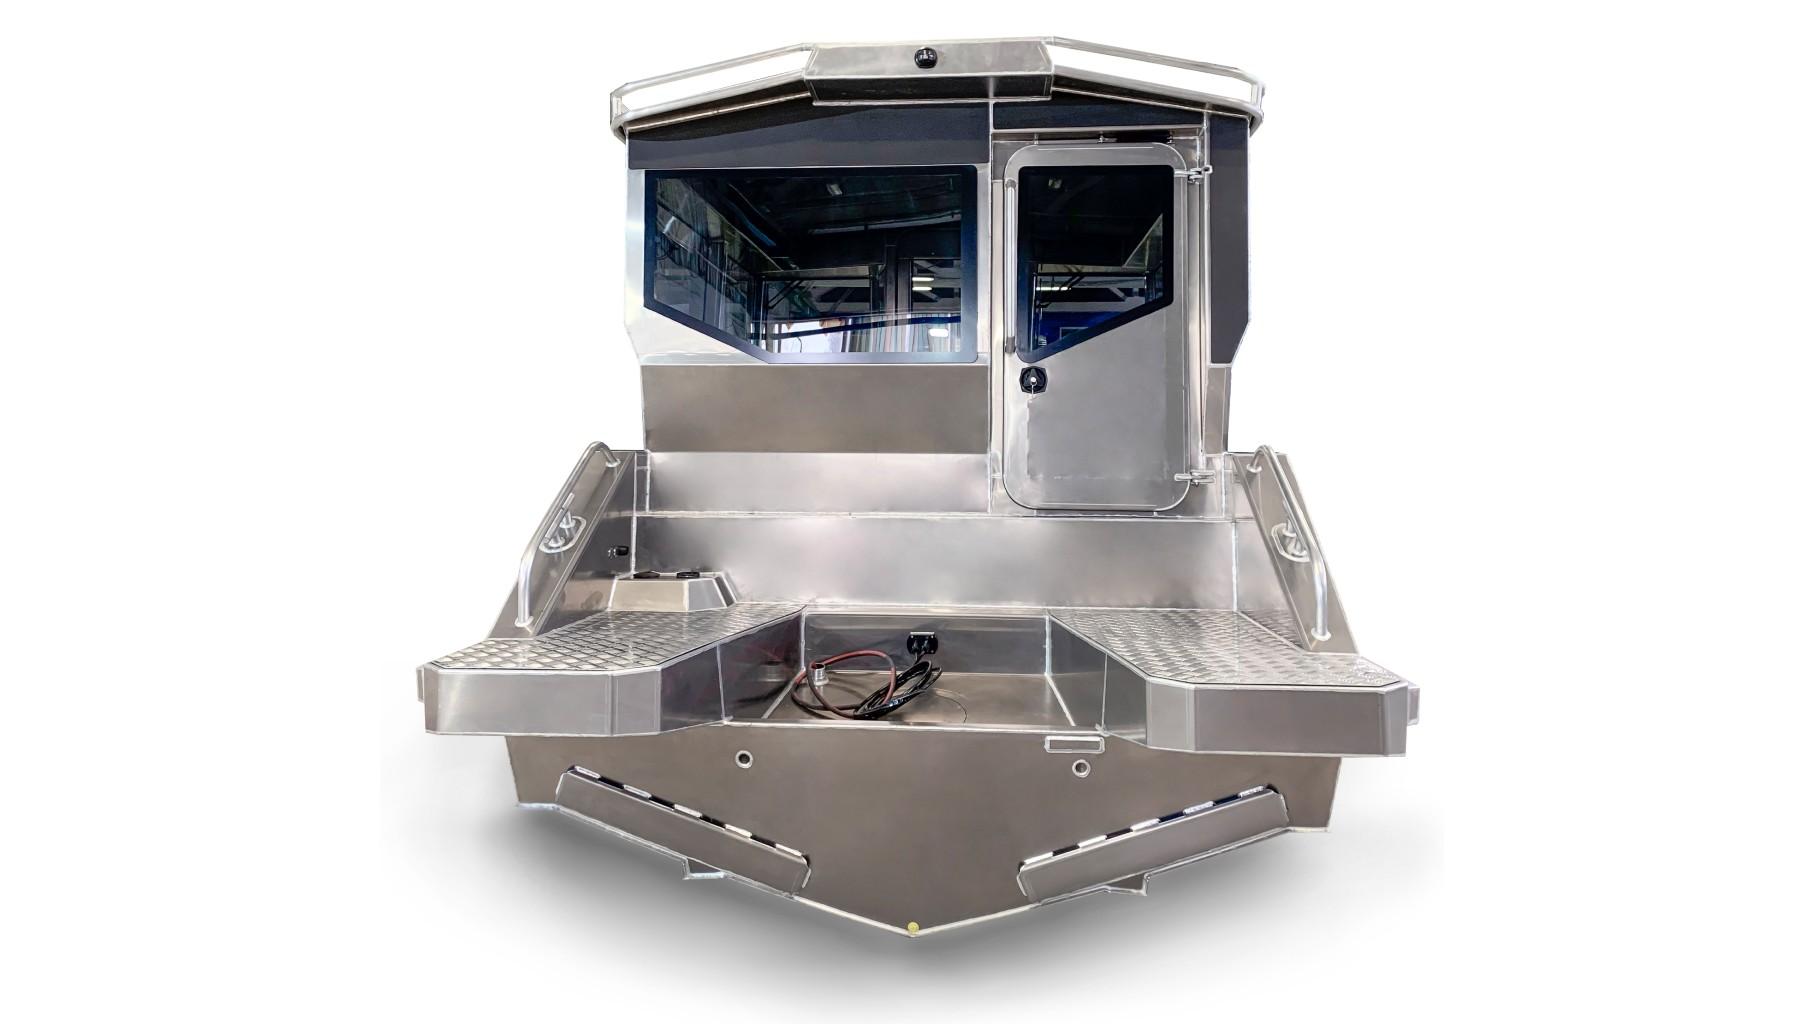 Aluminum Boat Victory W10 Landing Craft